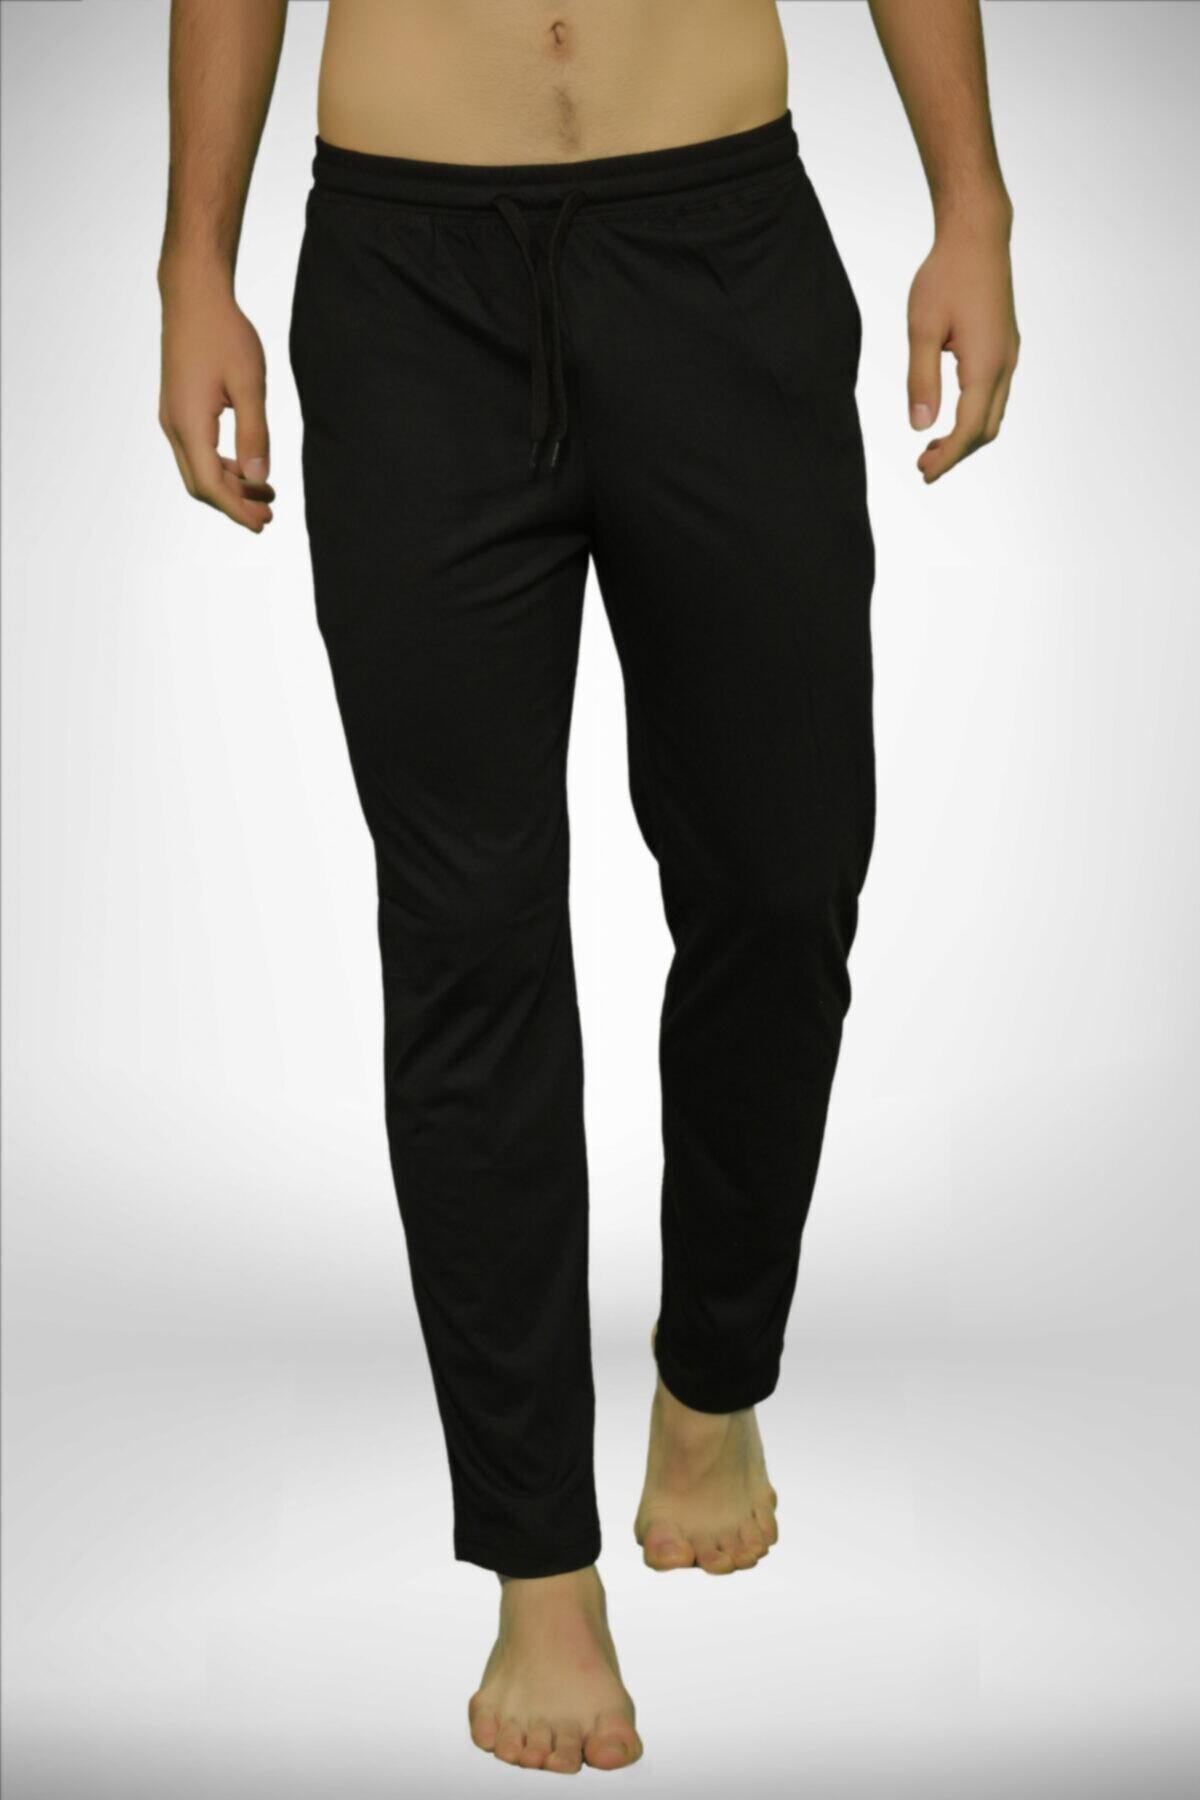 Erkek Siyah Bel Lastikli Cepli Tek Alt Düz Paça Pijama 6003